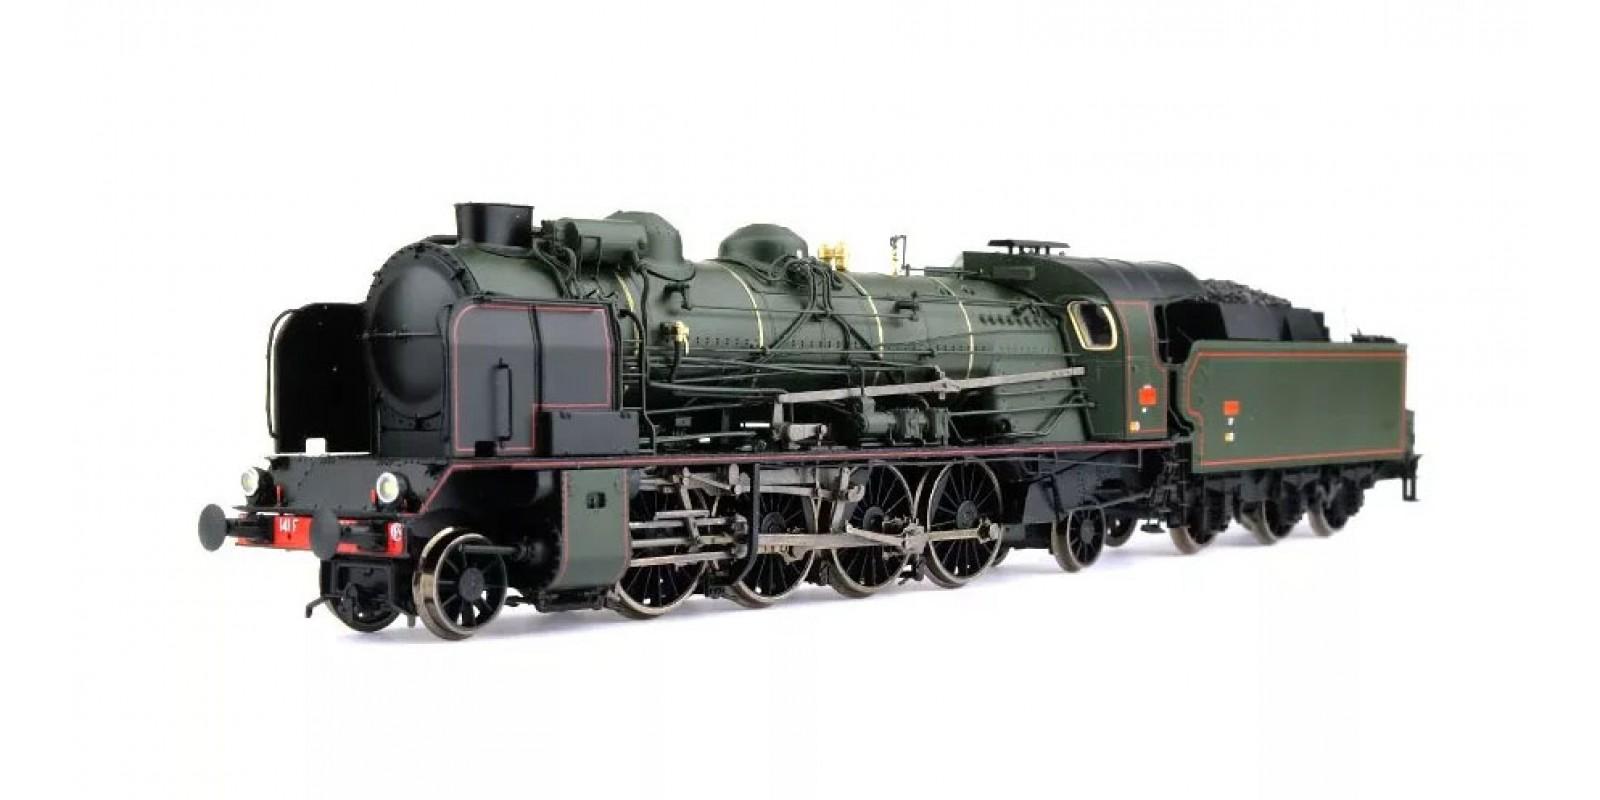 "REMB131SAC ""4-141 F 282 SNCF MONTLUÇON depot, ACFI water pump, 25 m³ 25 A 44 tender, preserved in  « La Cité du Train » MULHOUSE museum - AC Sound & Smoke (3 tracks)"""